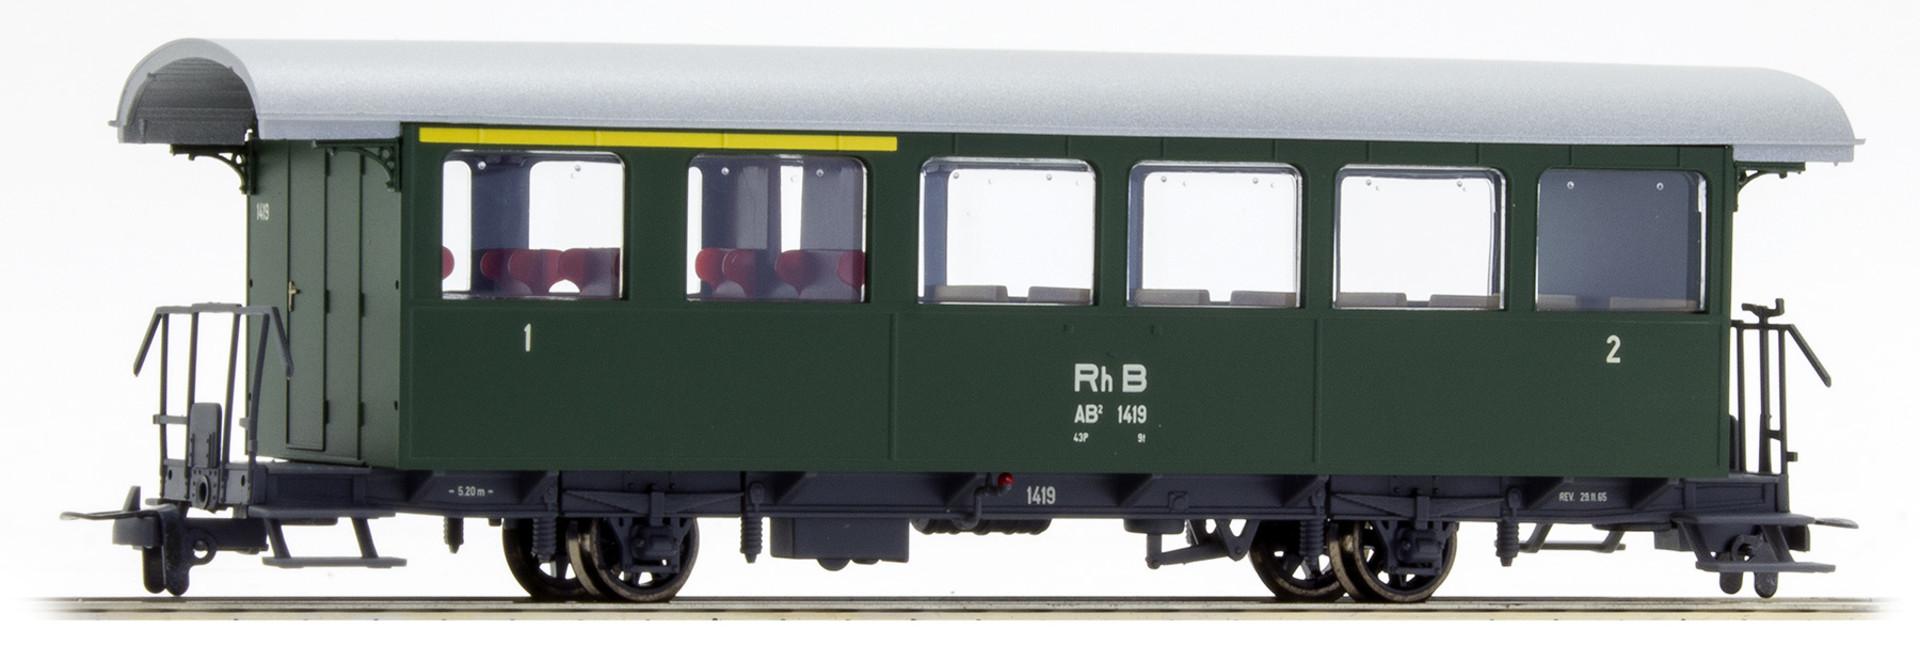 3233129 RhB AB2 1419 Zweiachser grün